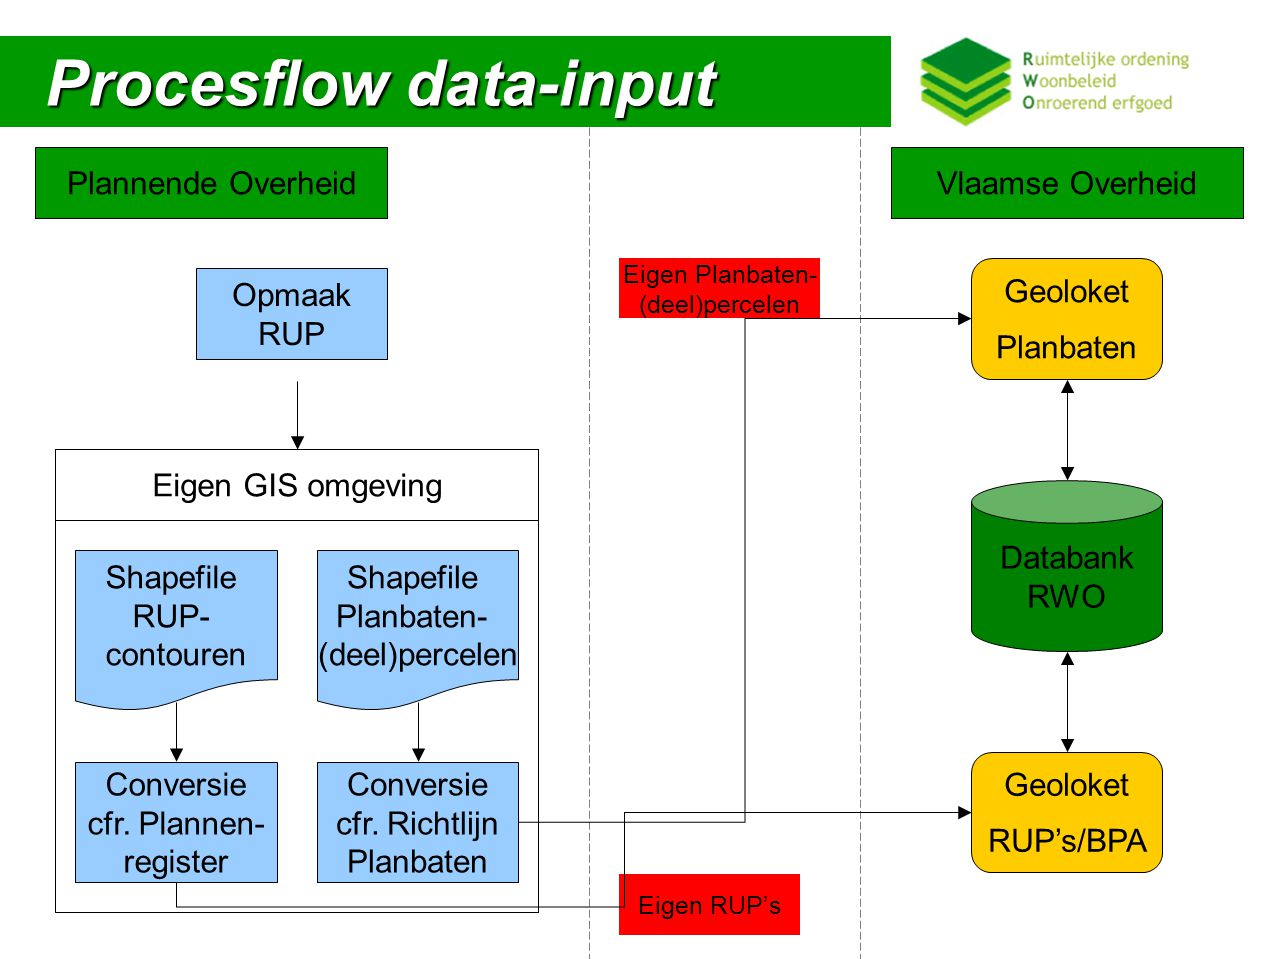 Procesflow data-input